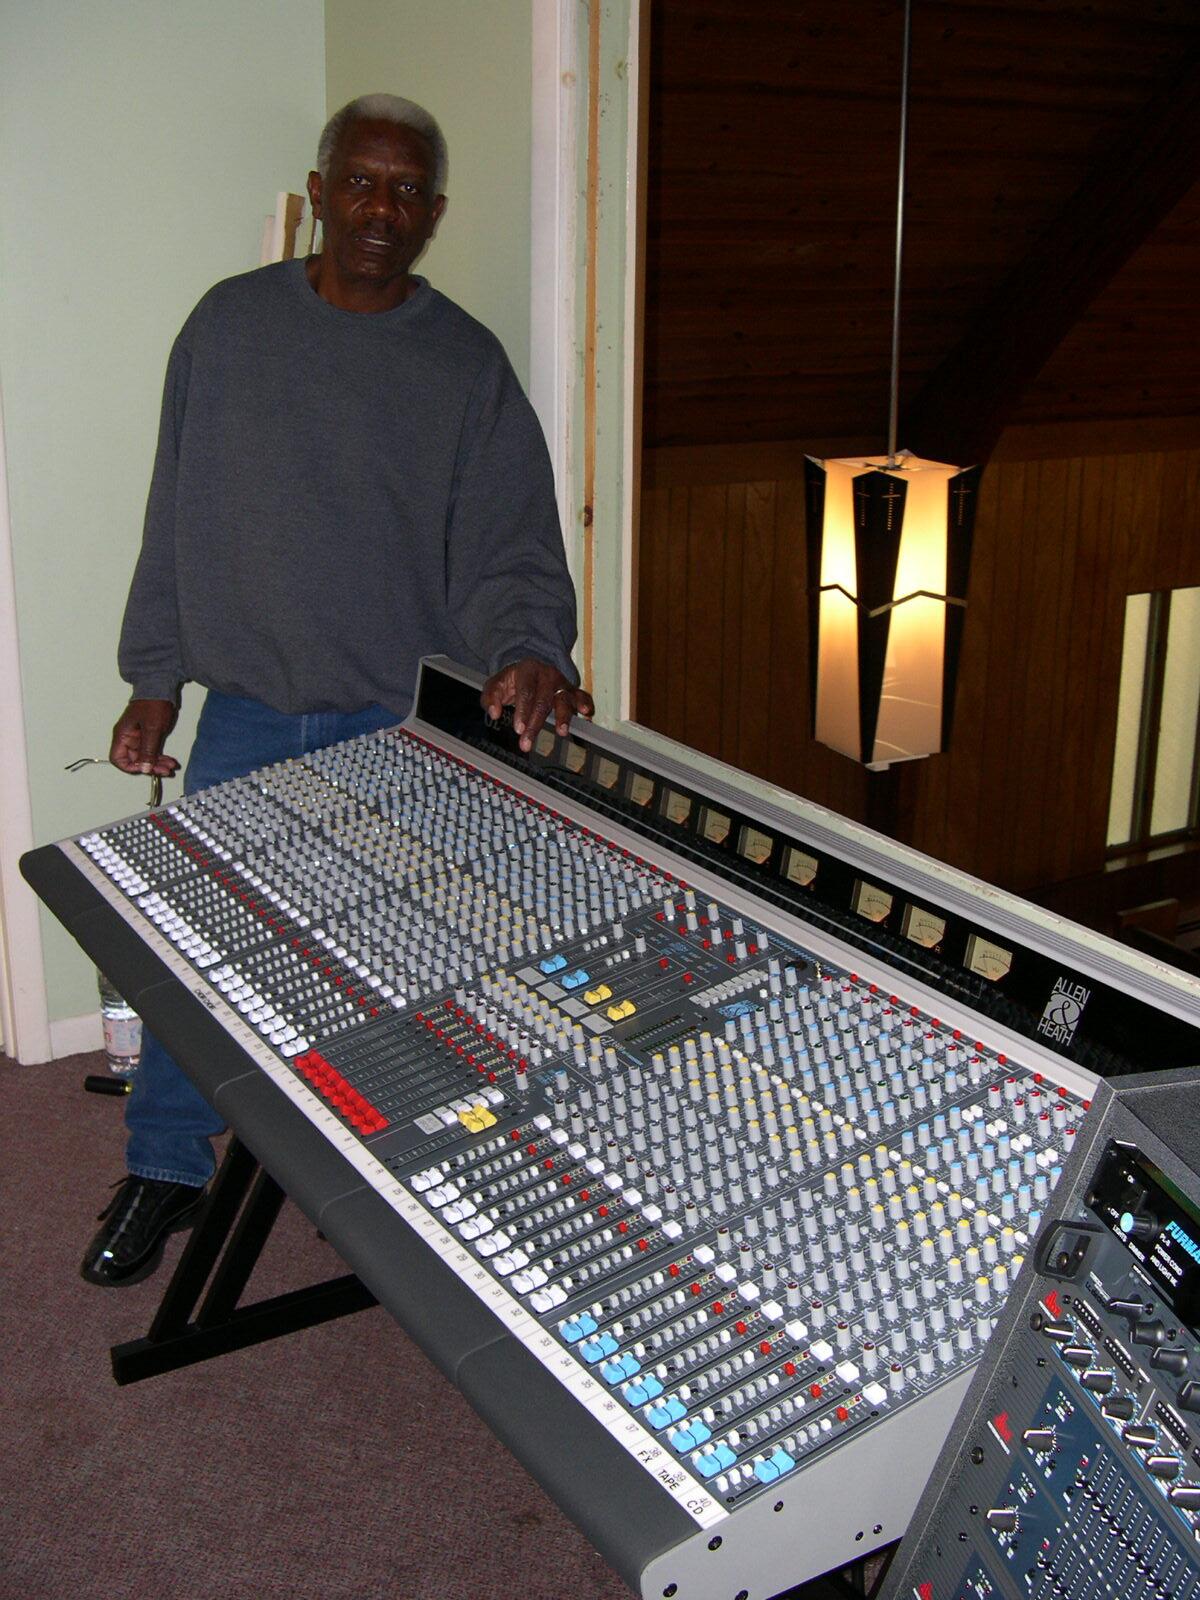 Dbx 1231: Our Sound System